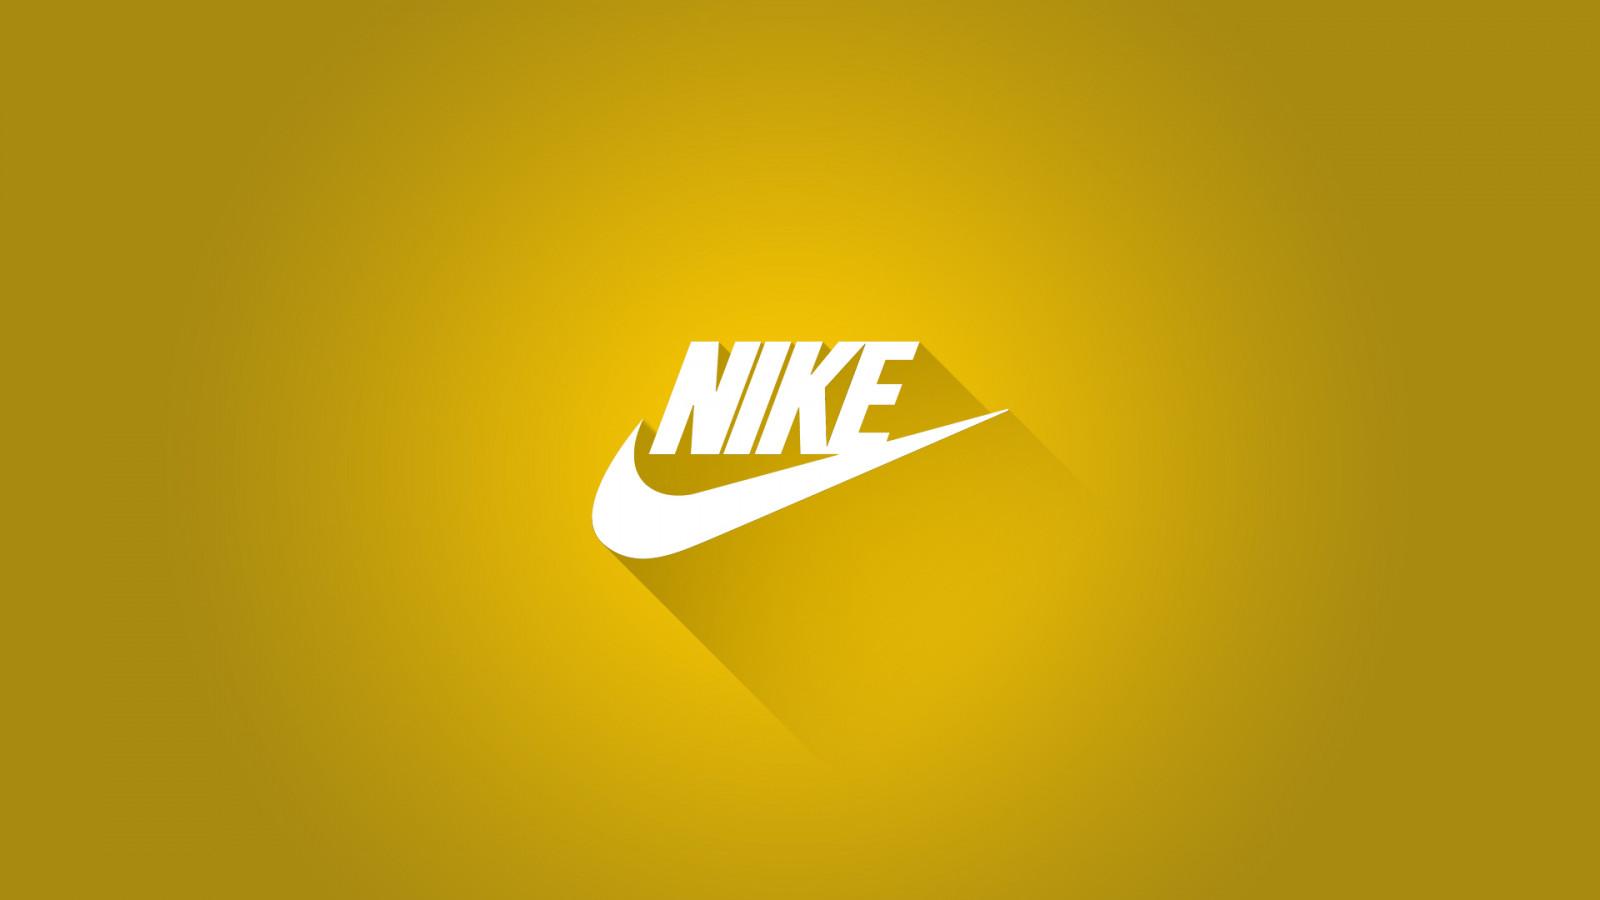 Fond D Ecran Nike Illustration Sport Texte Logo Jaune